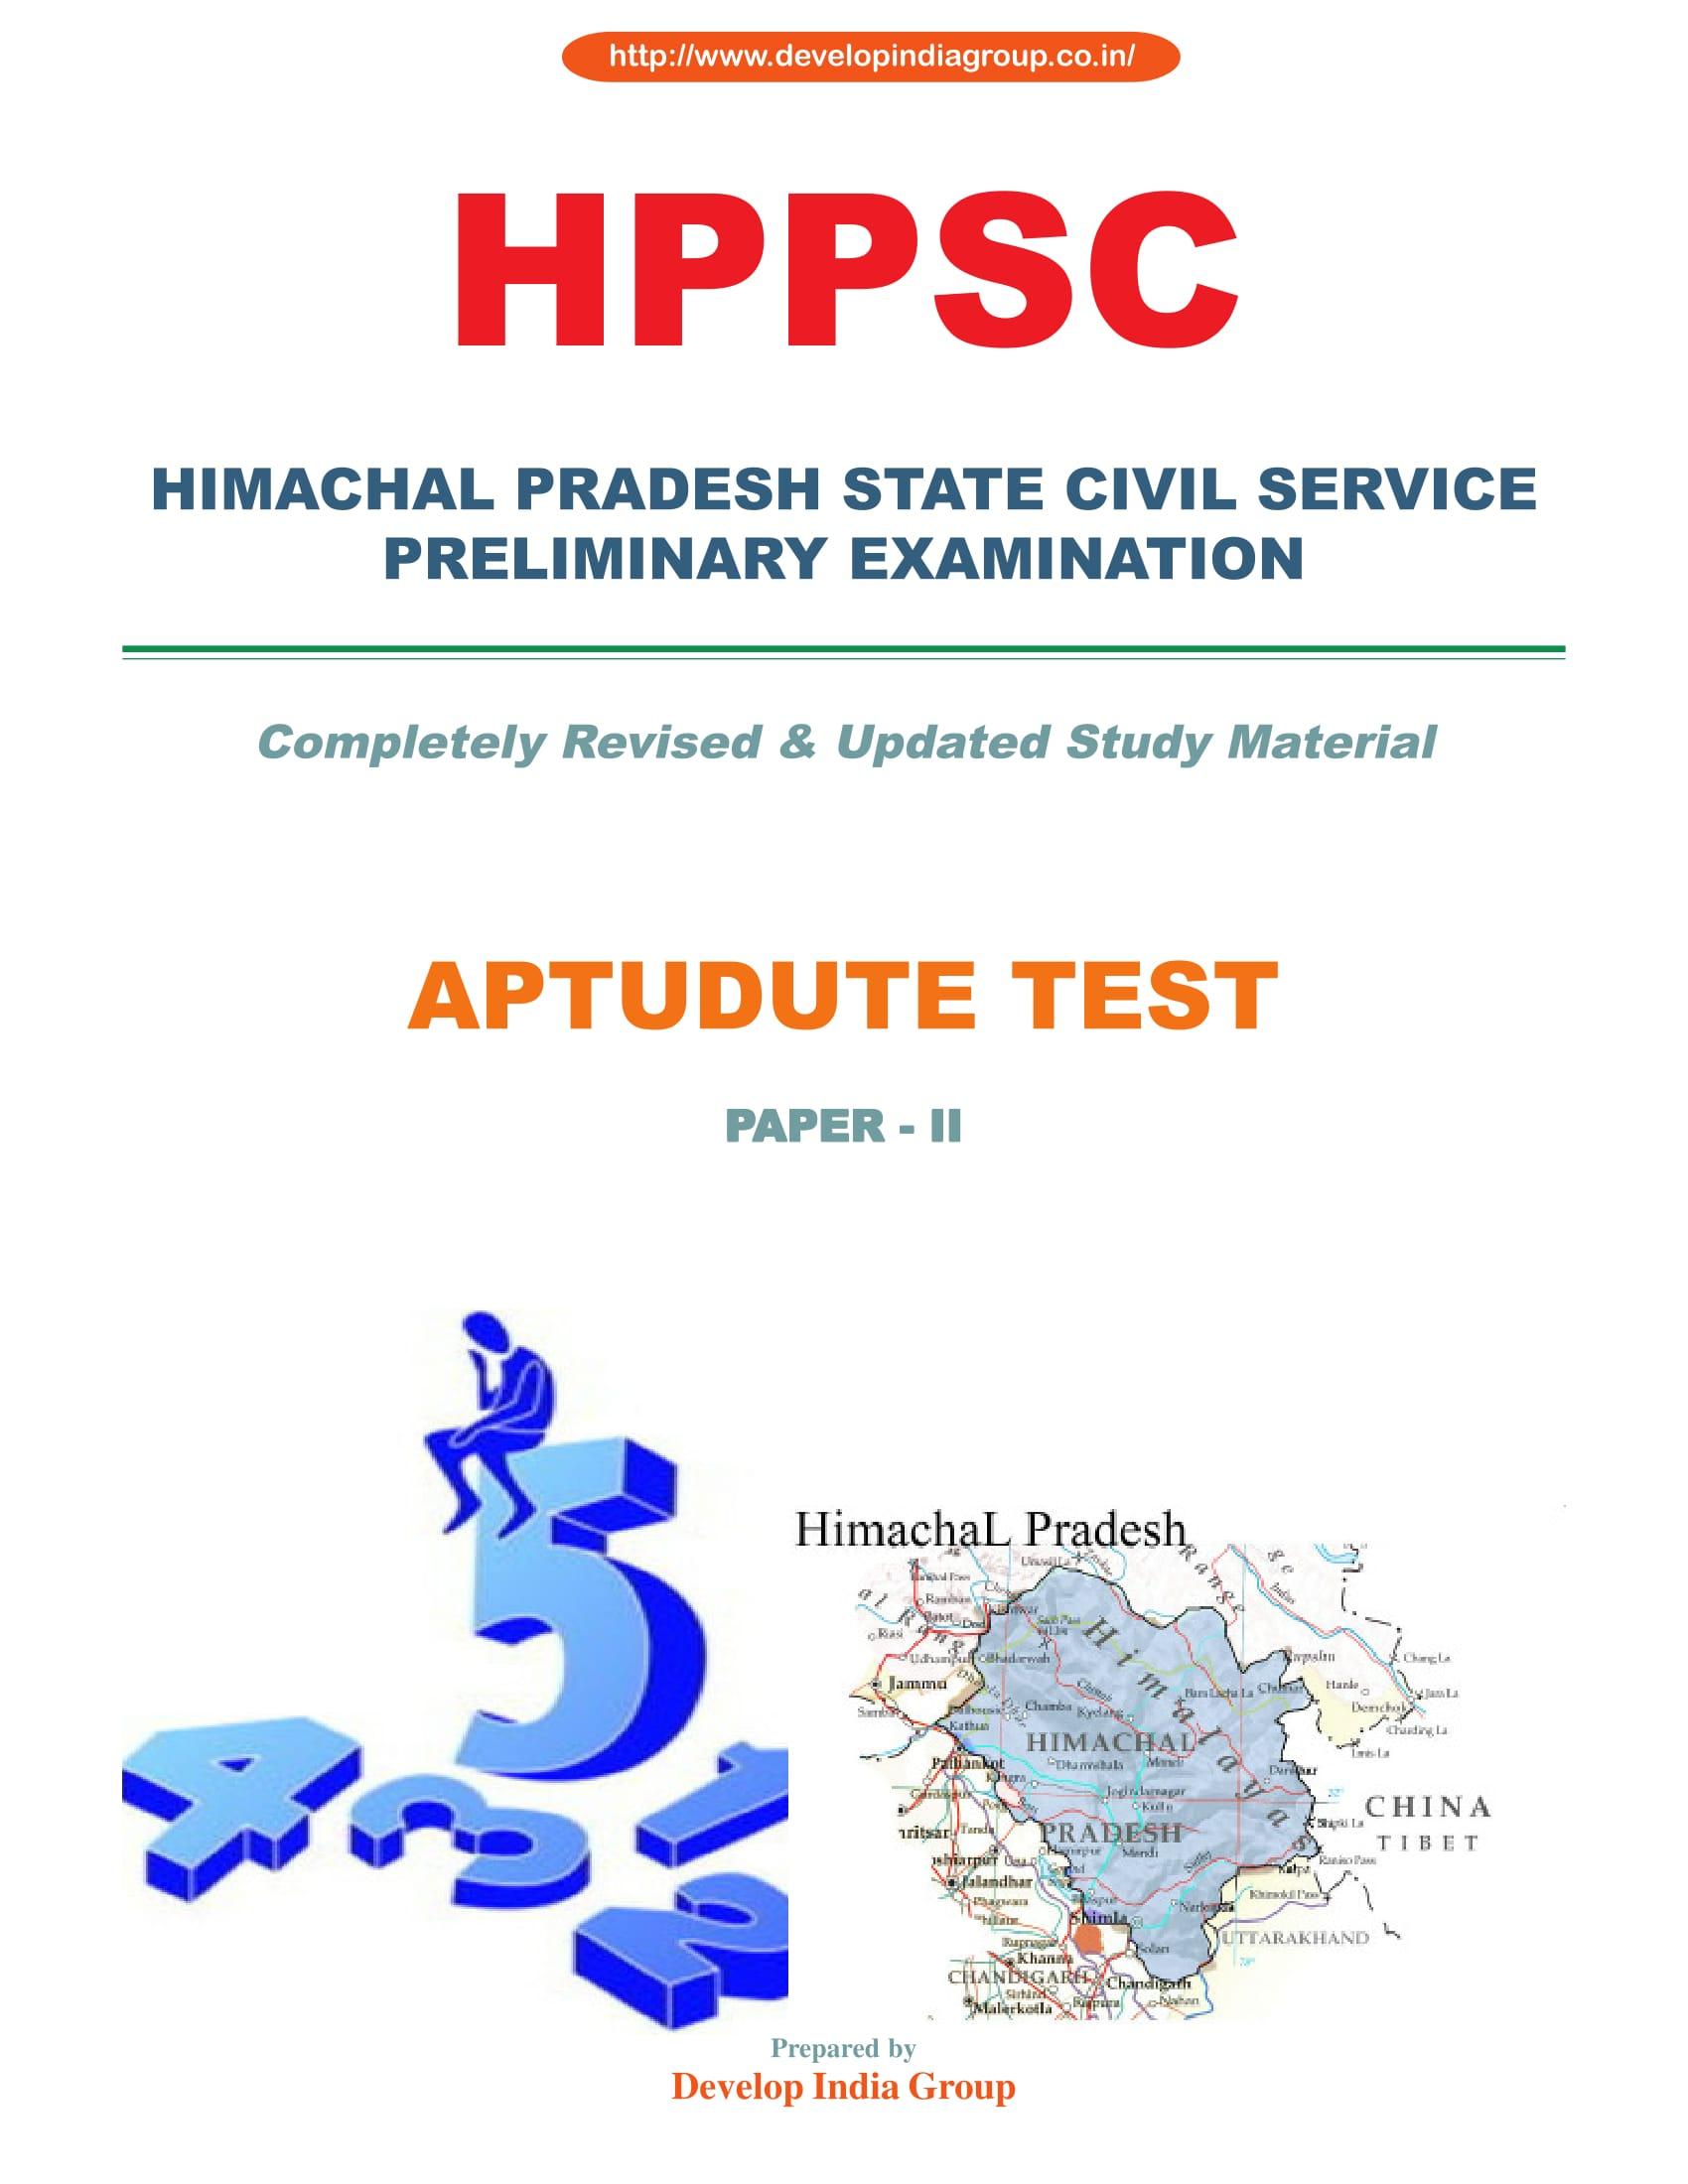 test in himachal pradesh